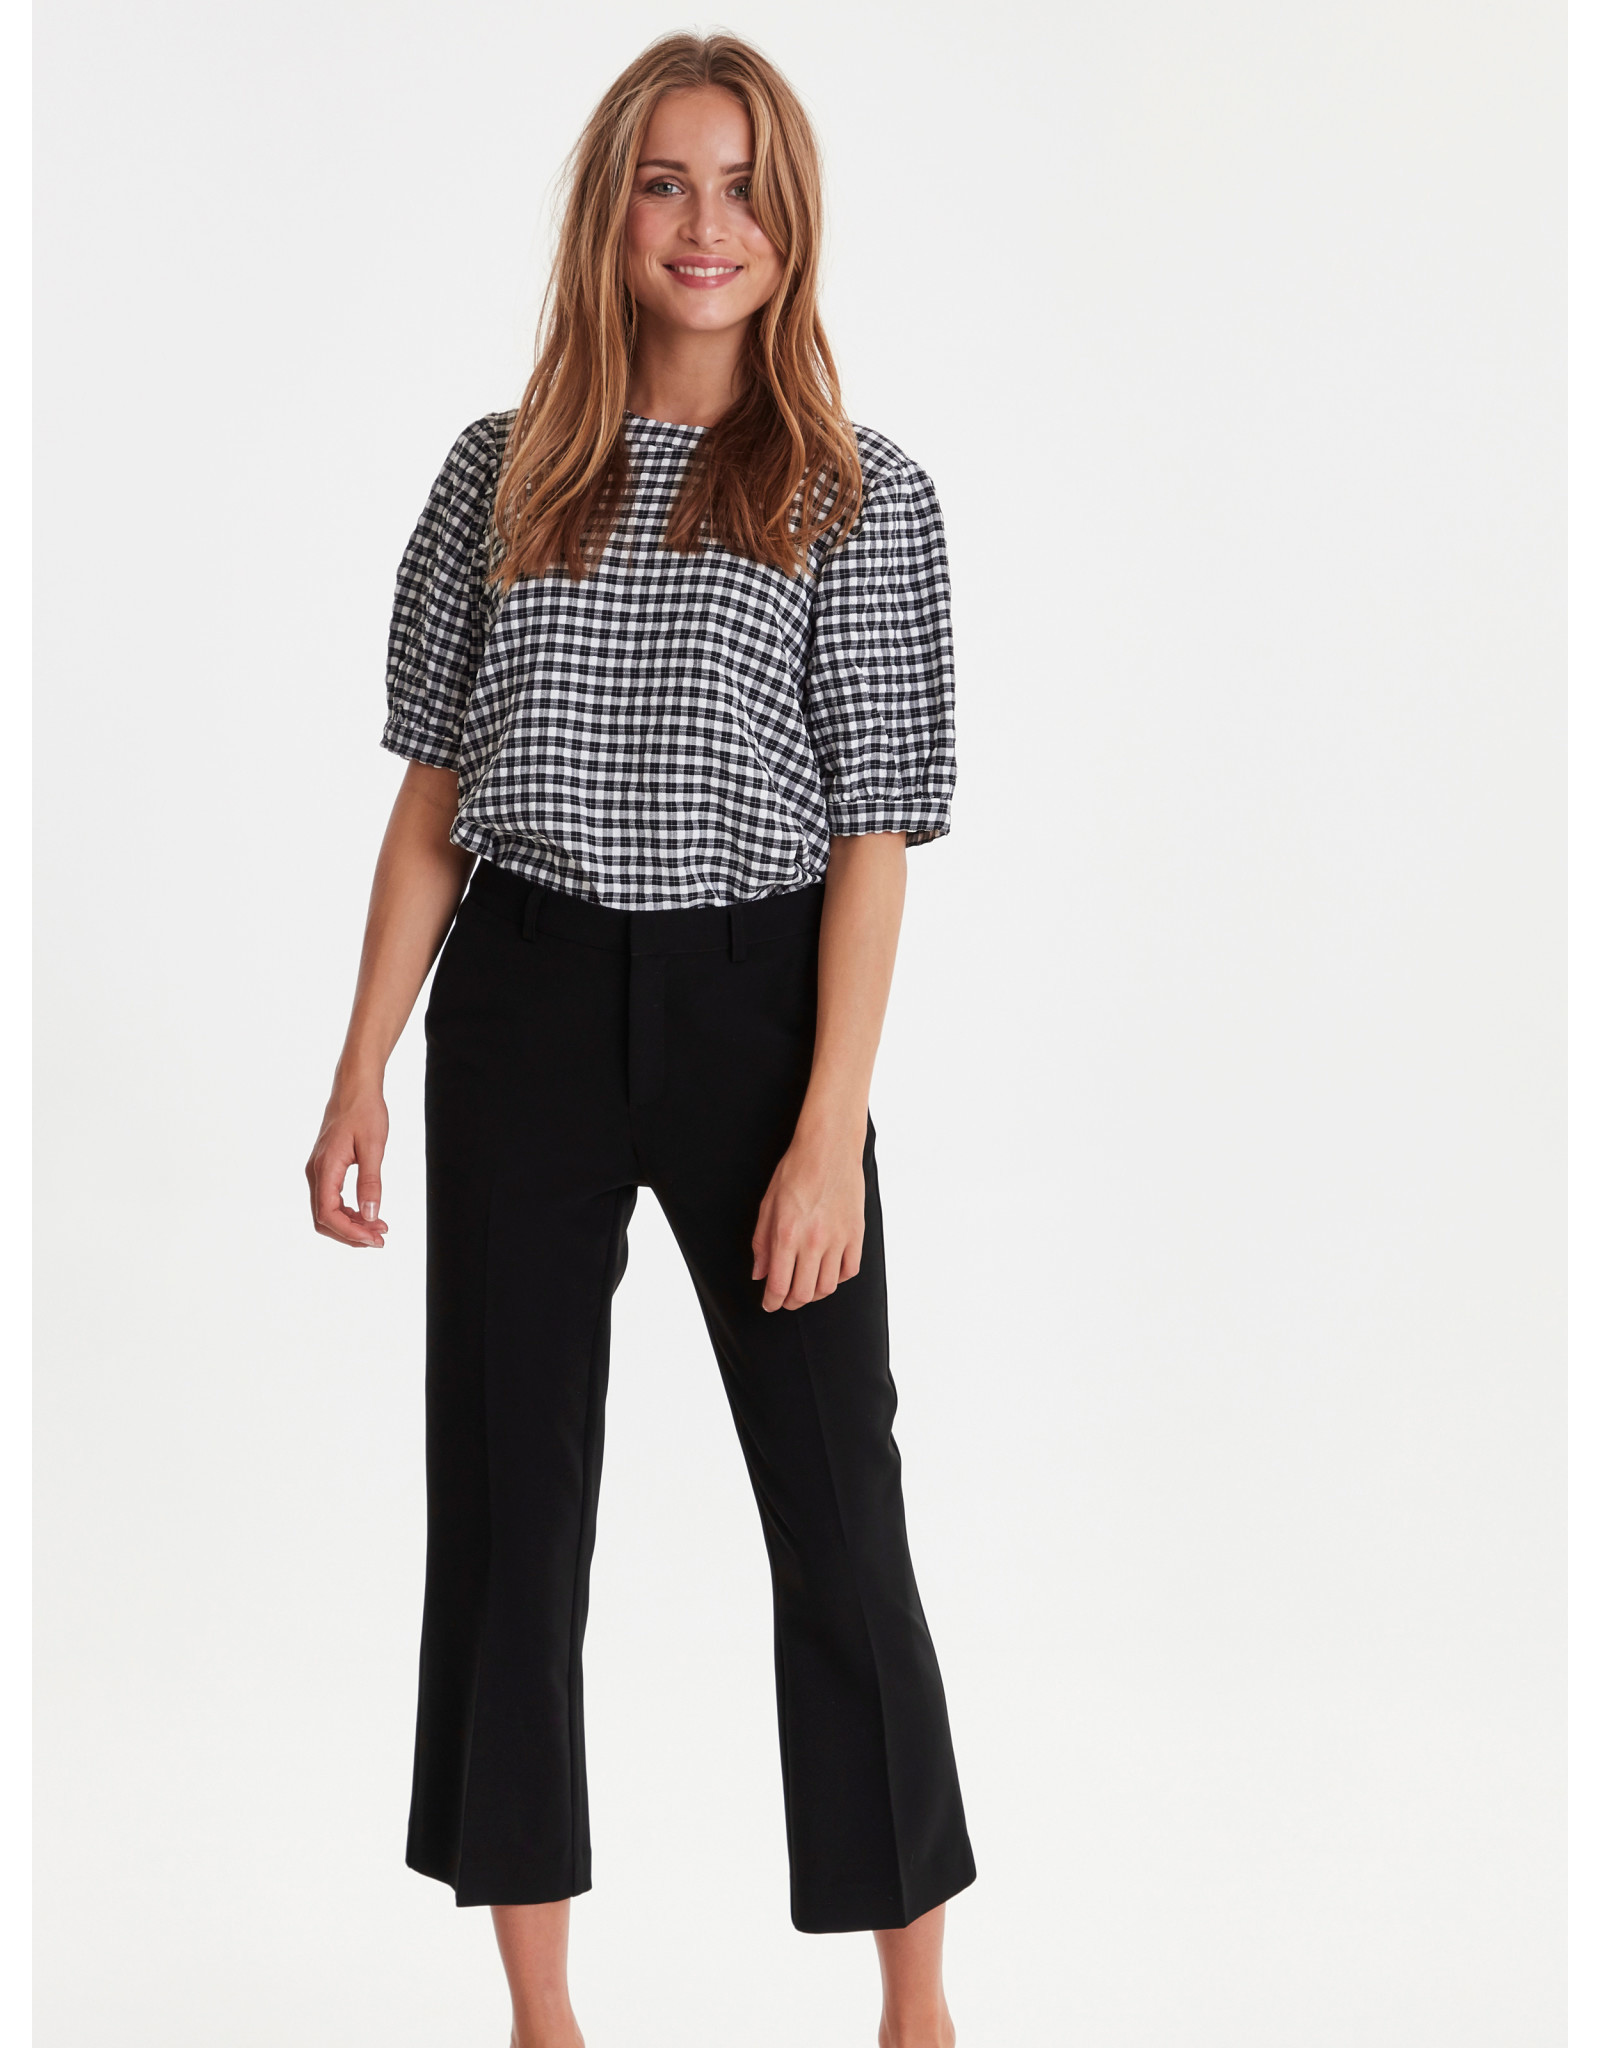 ICHI ICHI - Lexi trousers (black)